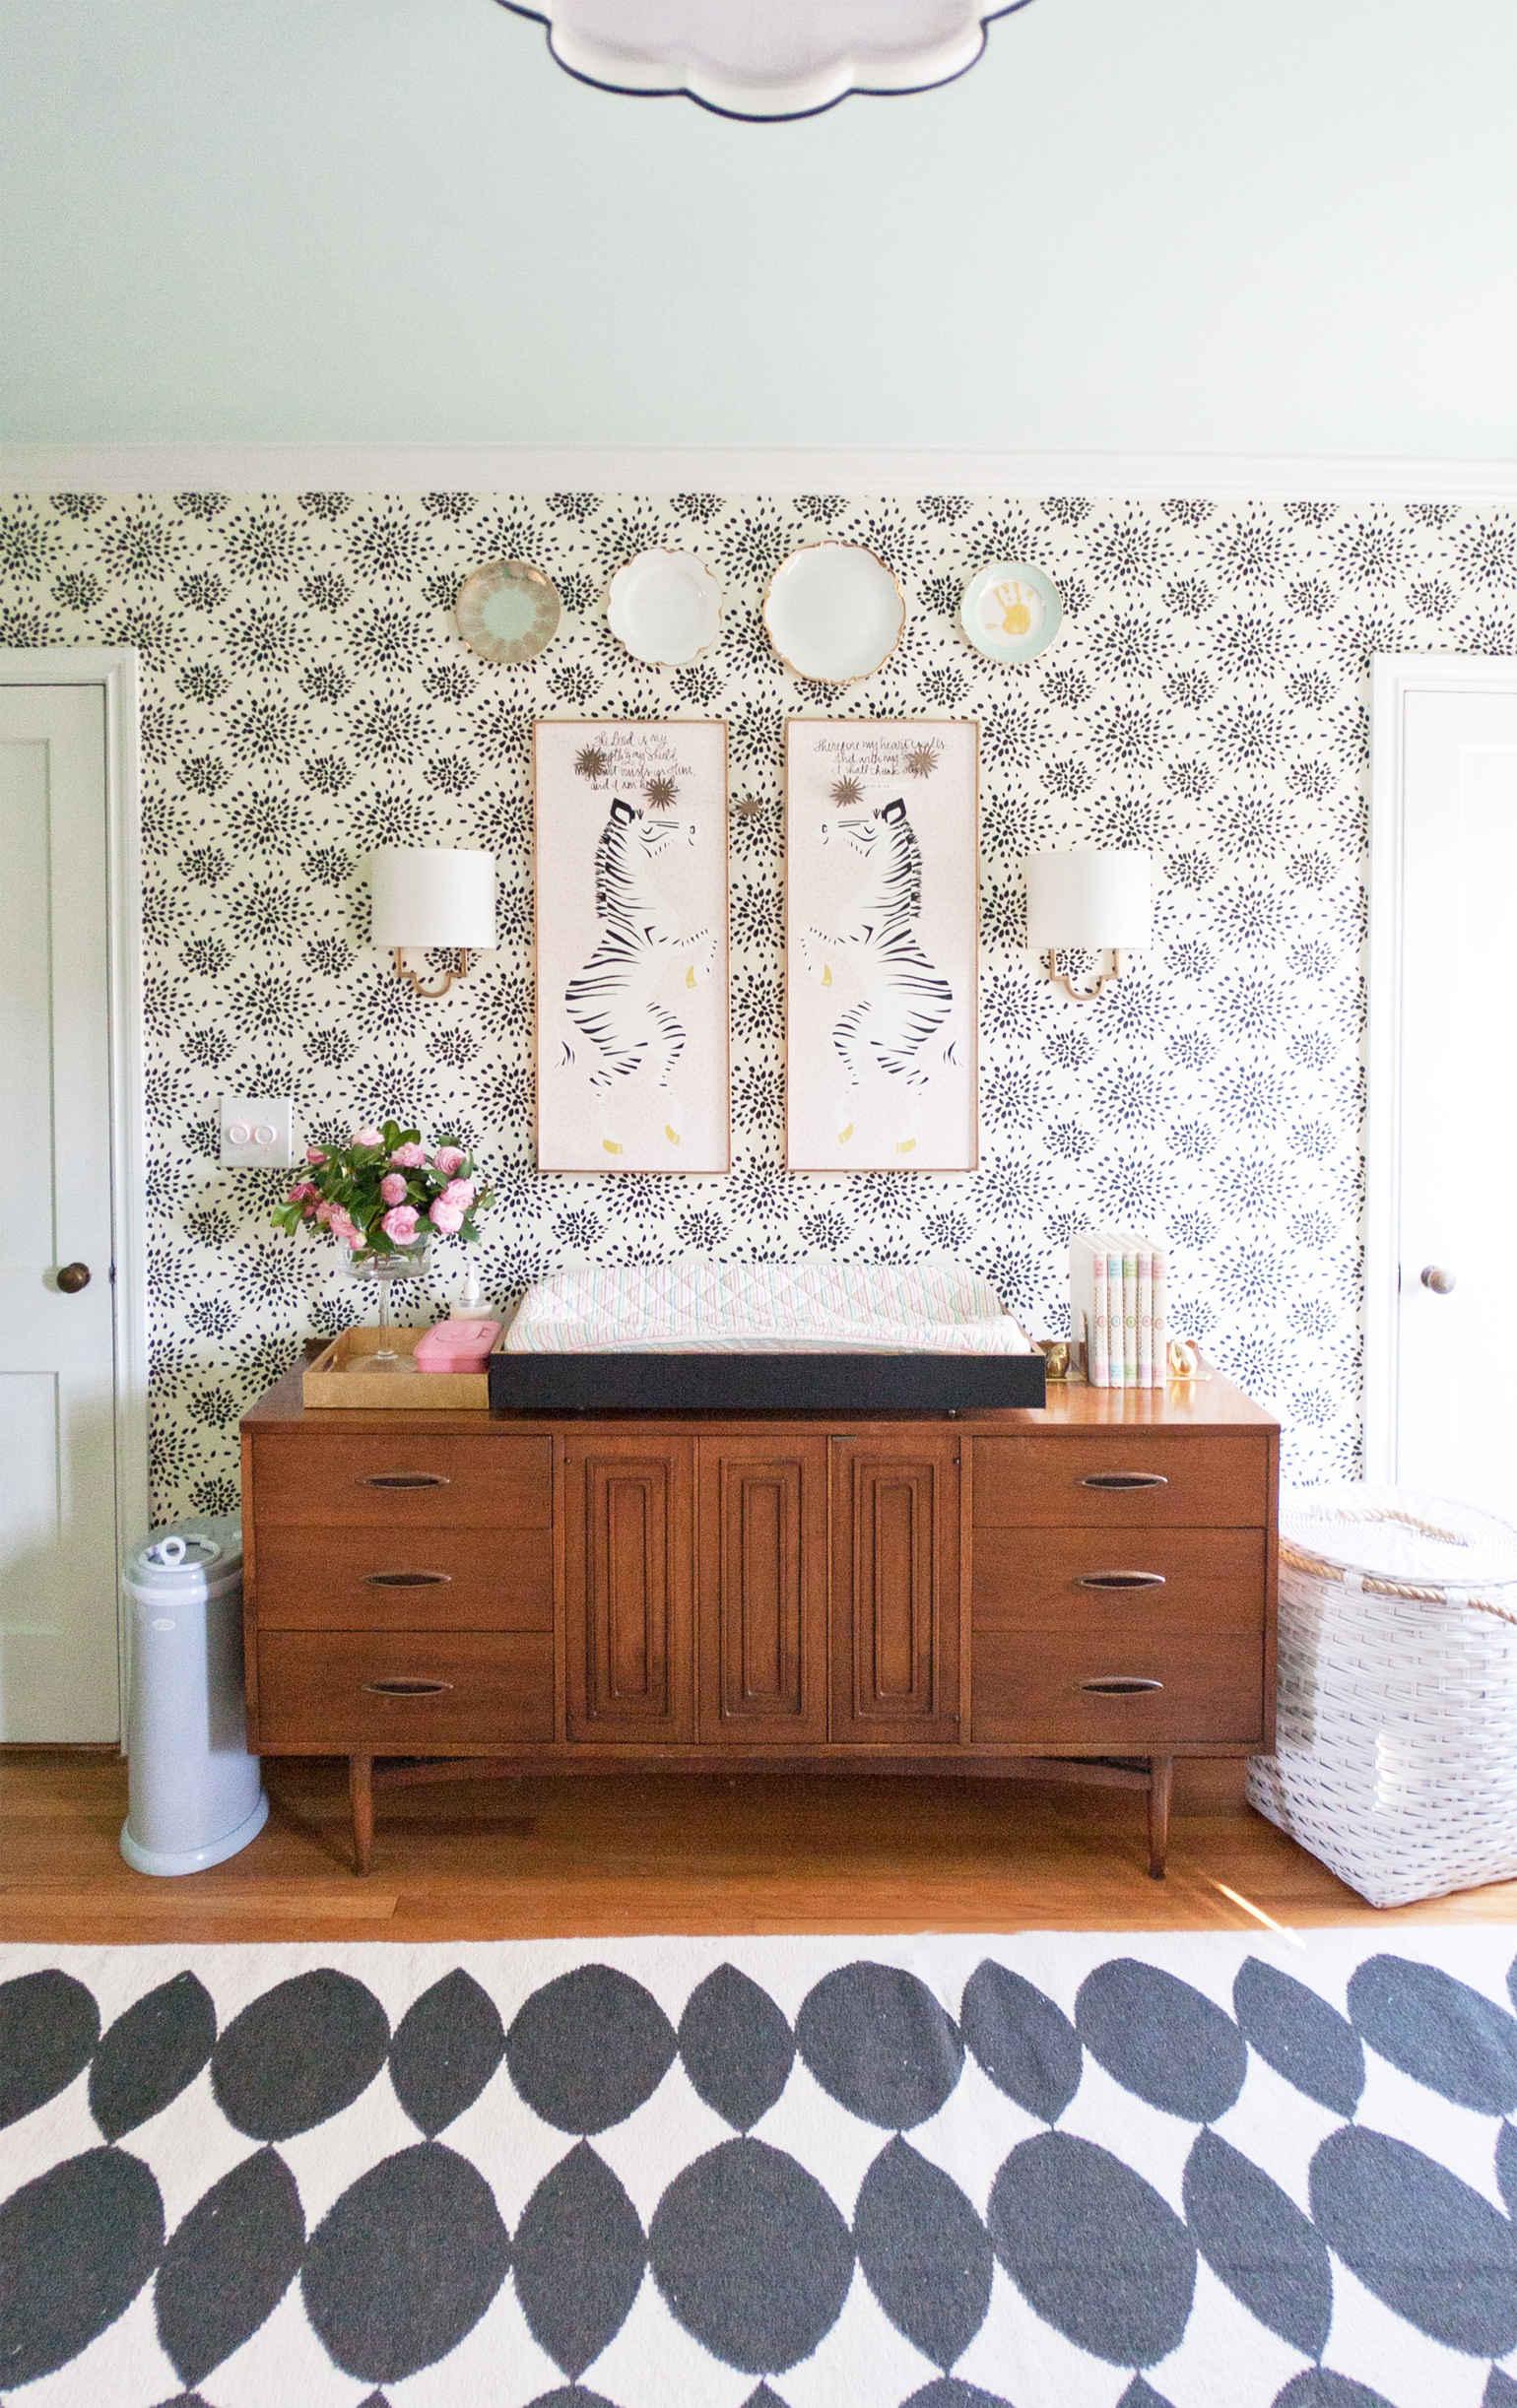 Wallpaper wall hucq68